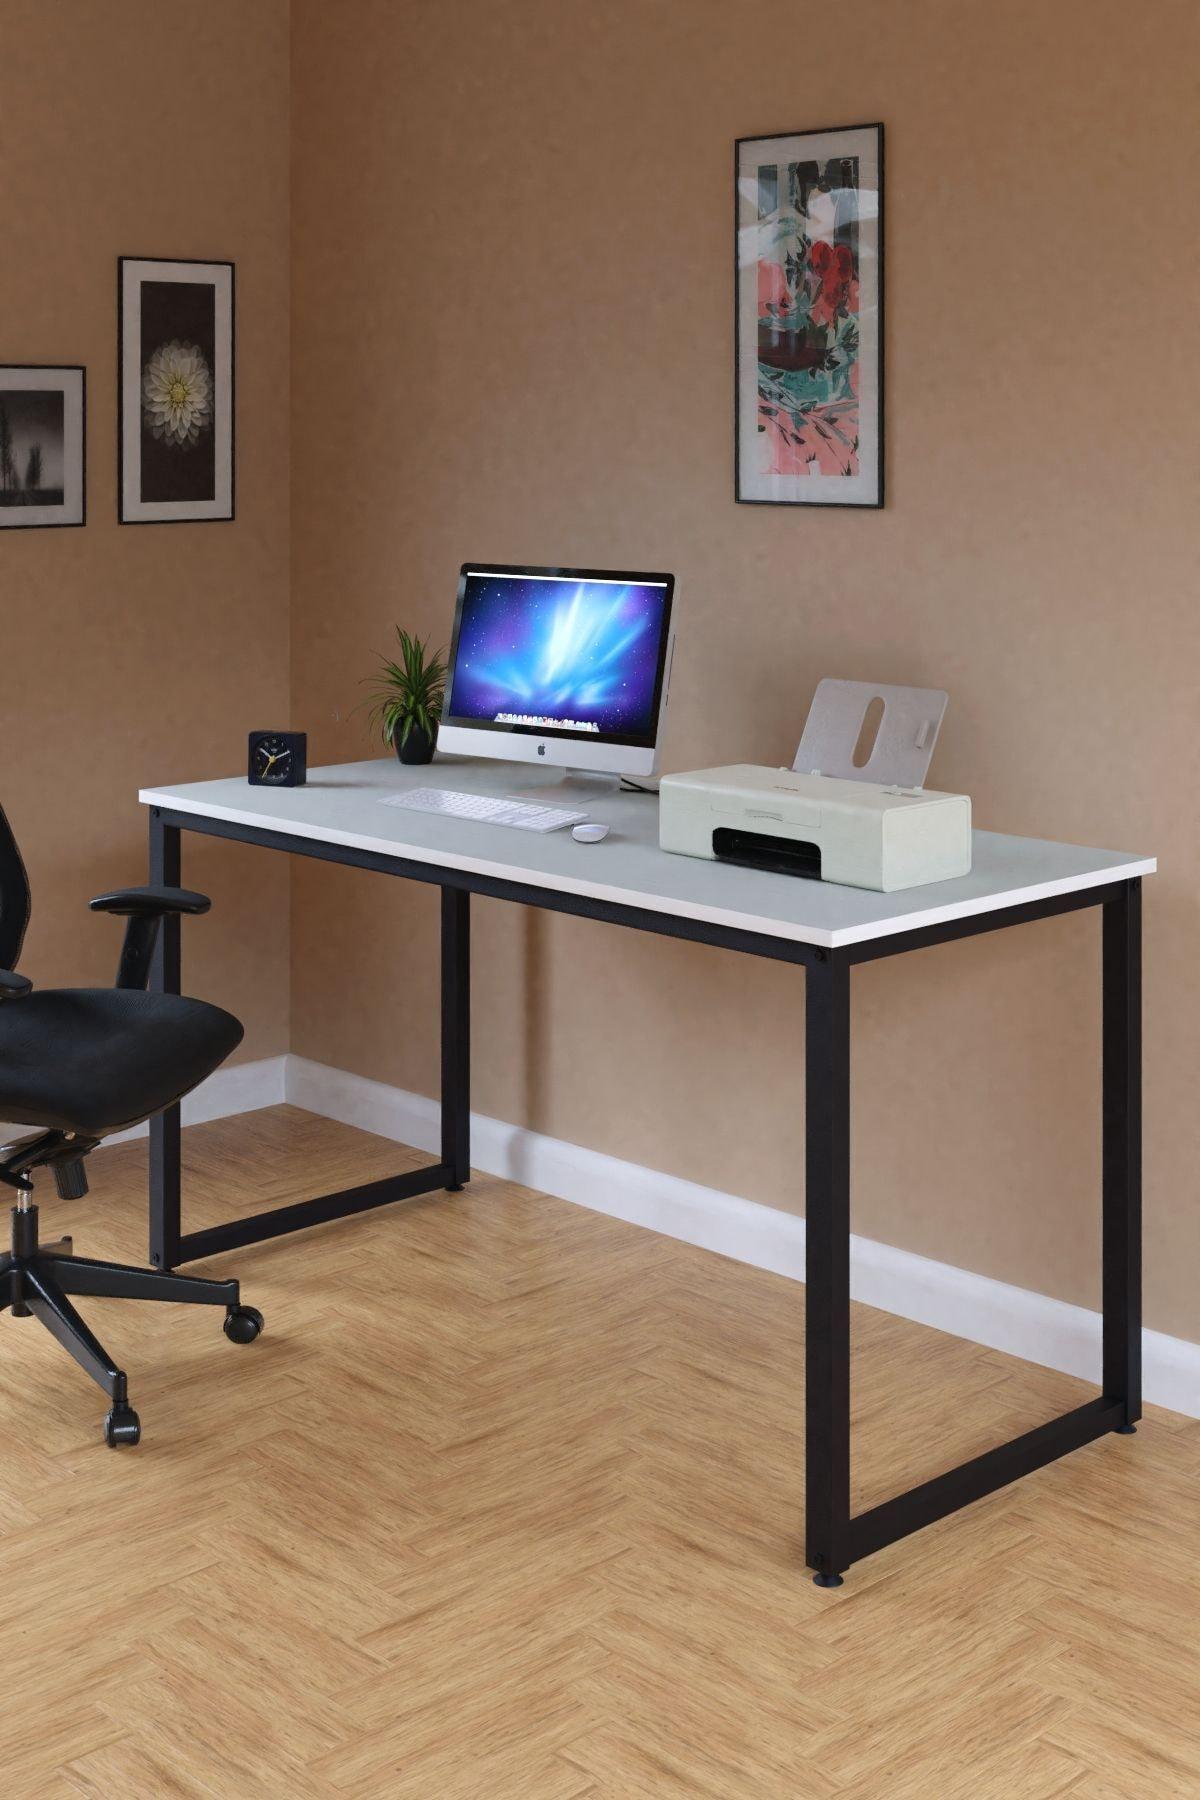 Çalışma Masası Bilgisayar Masası Ofis Masası 60x140 cm Beyaz